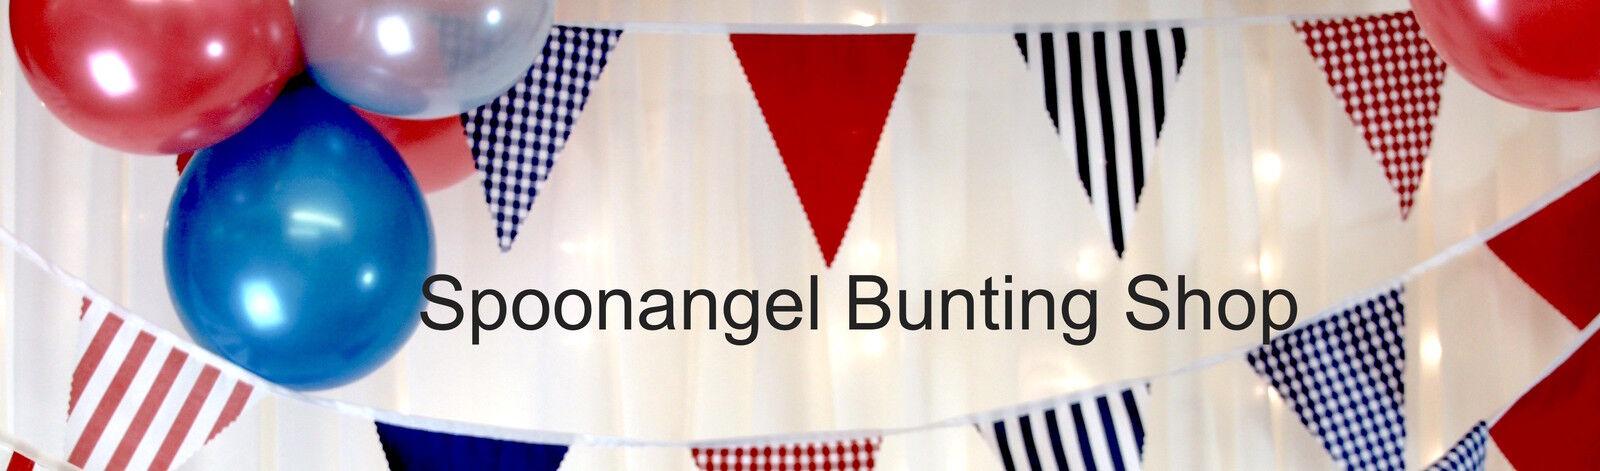 Spoonangel Bunting Shoppe